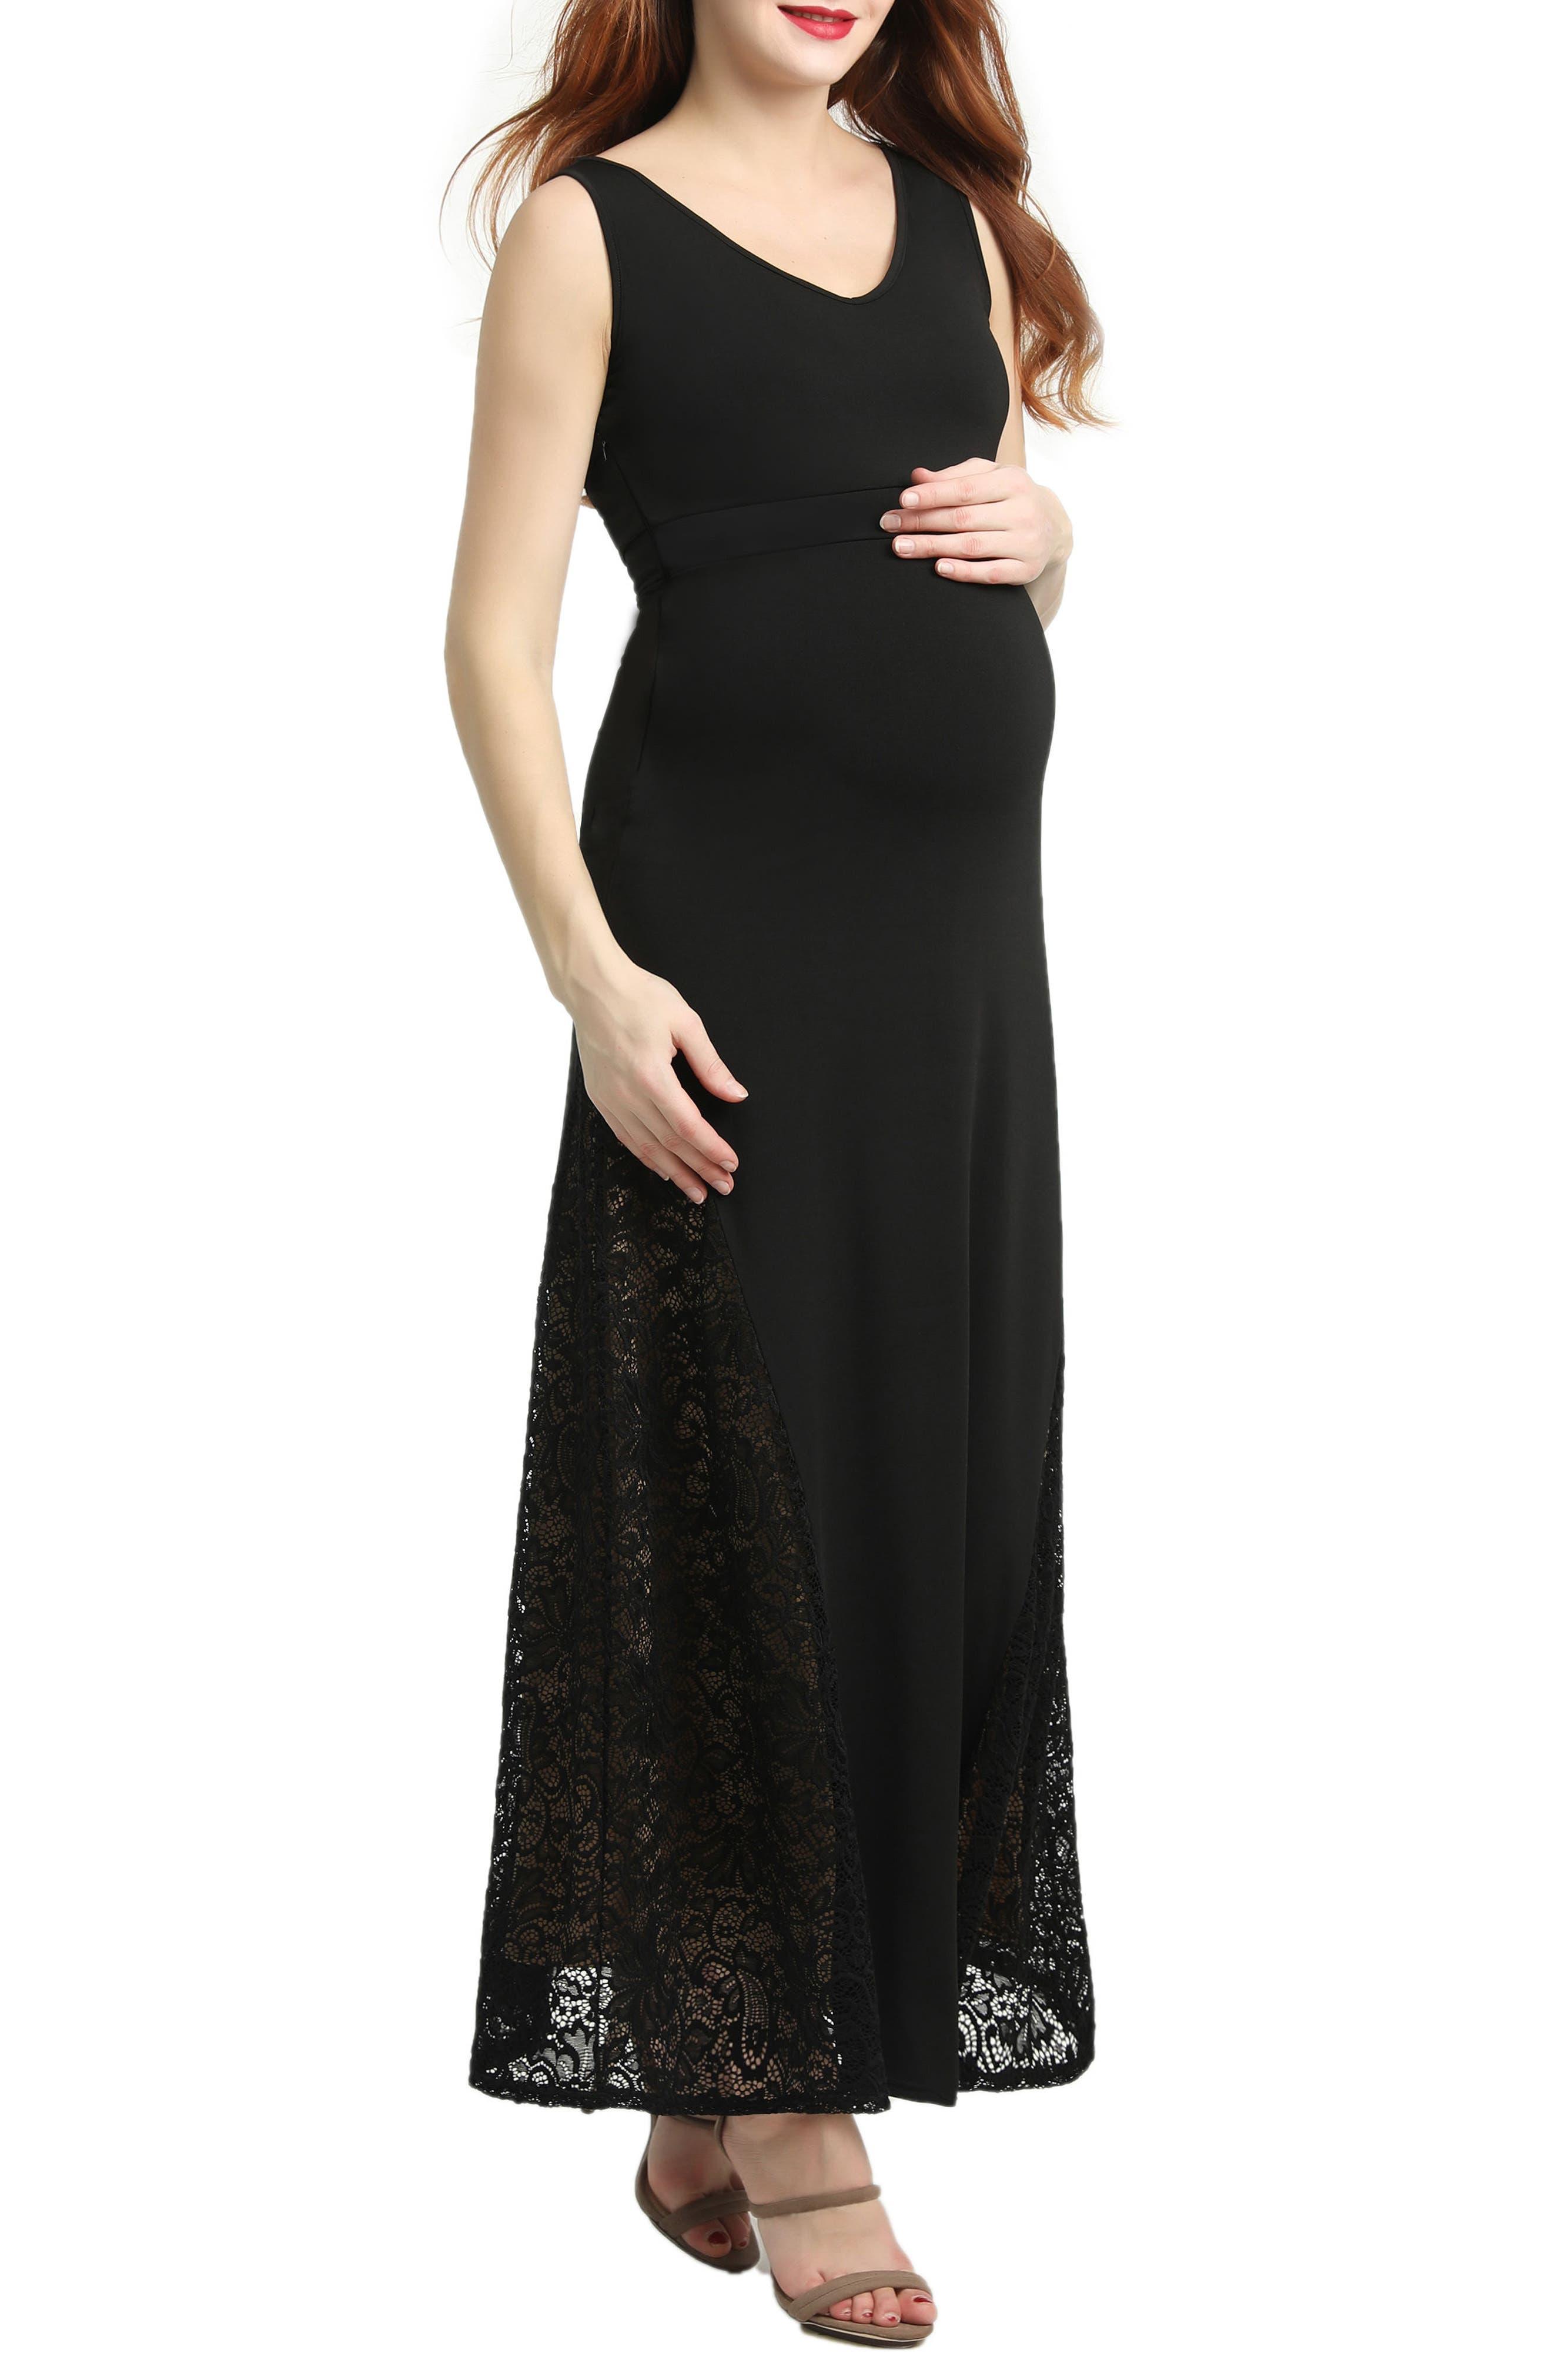 Elizabeth Lace Maternity Maxi Dress,                         Main,                         color, Black